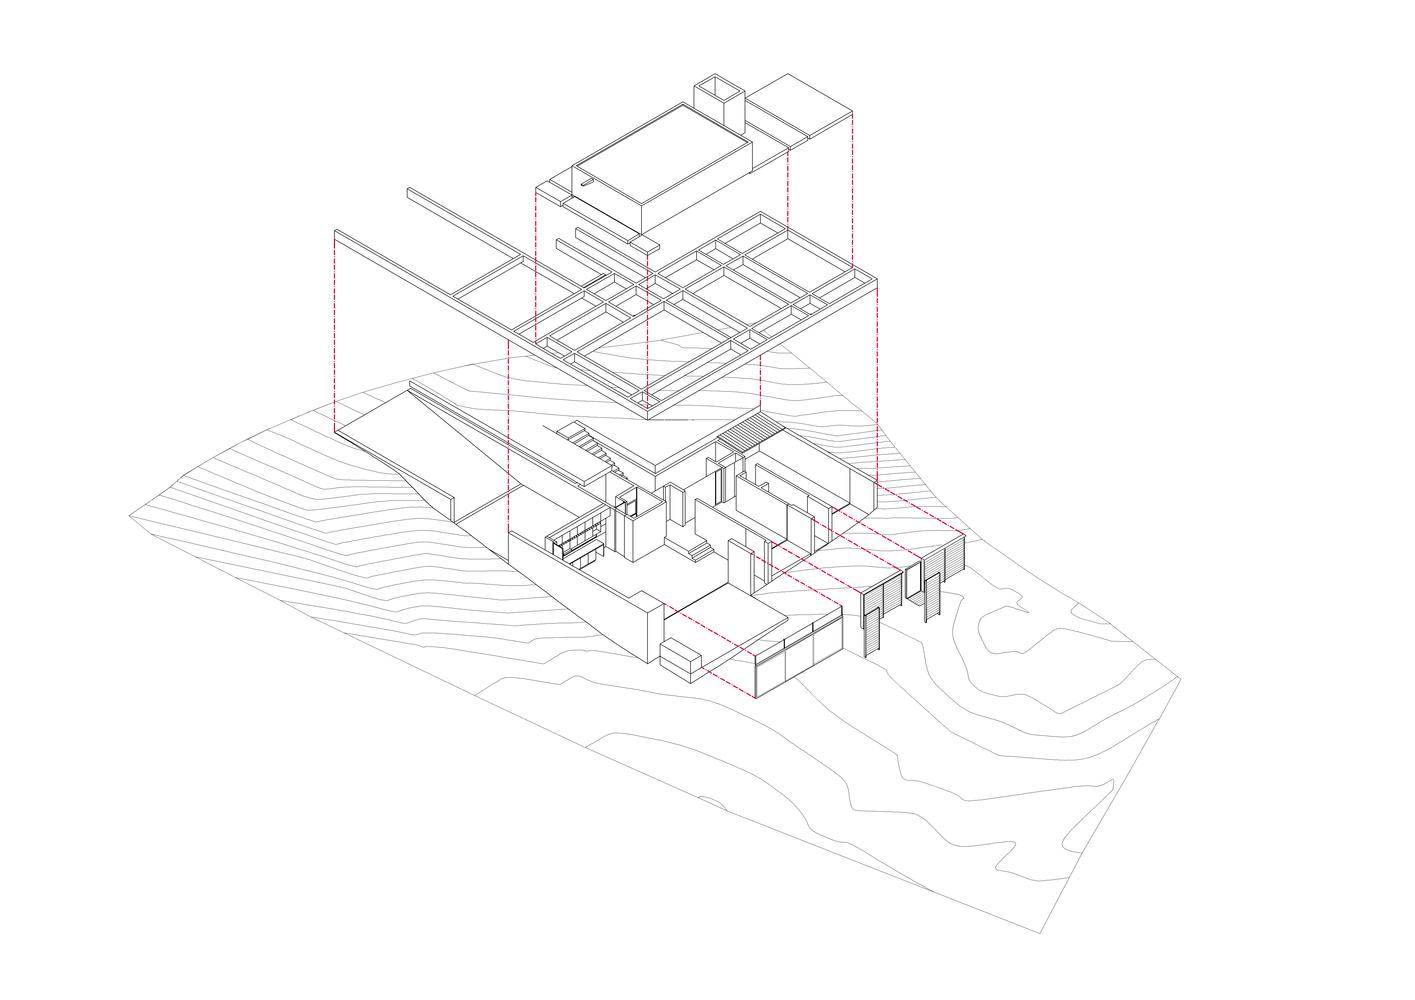 GPL House isometric plan view